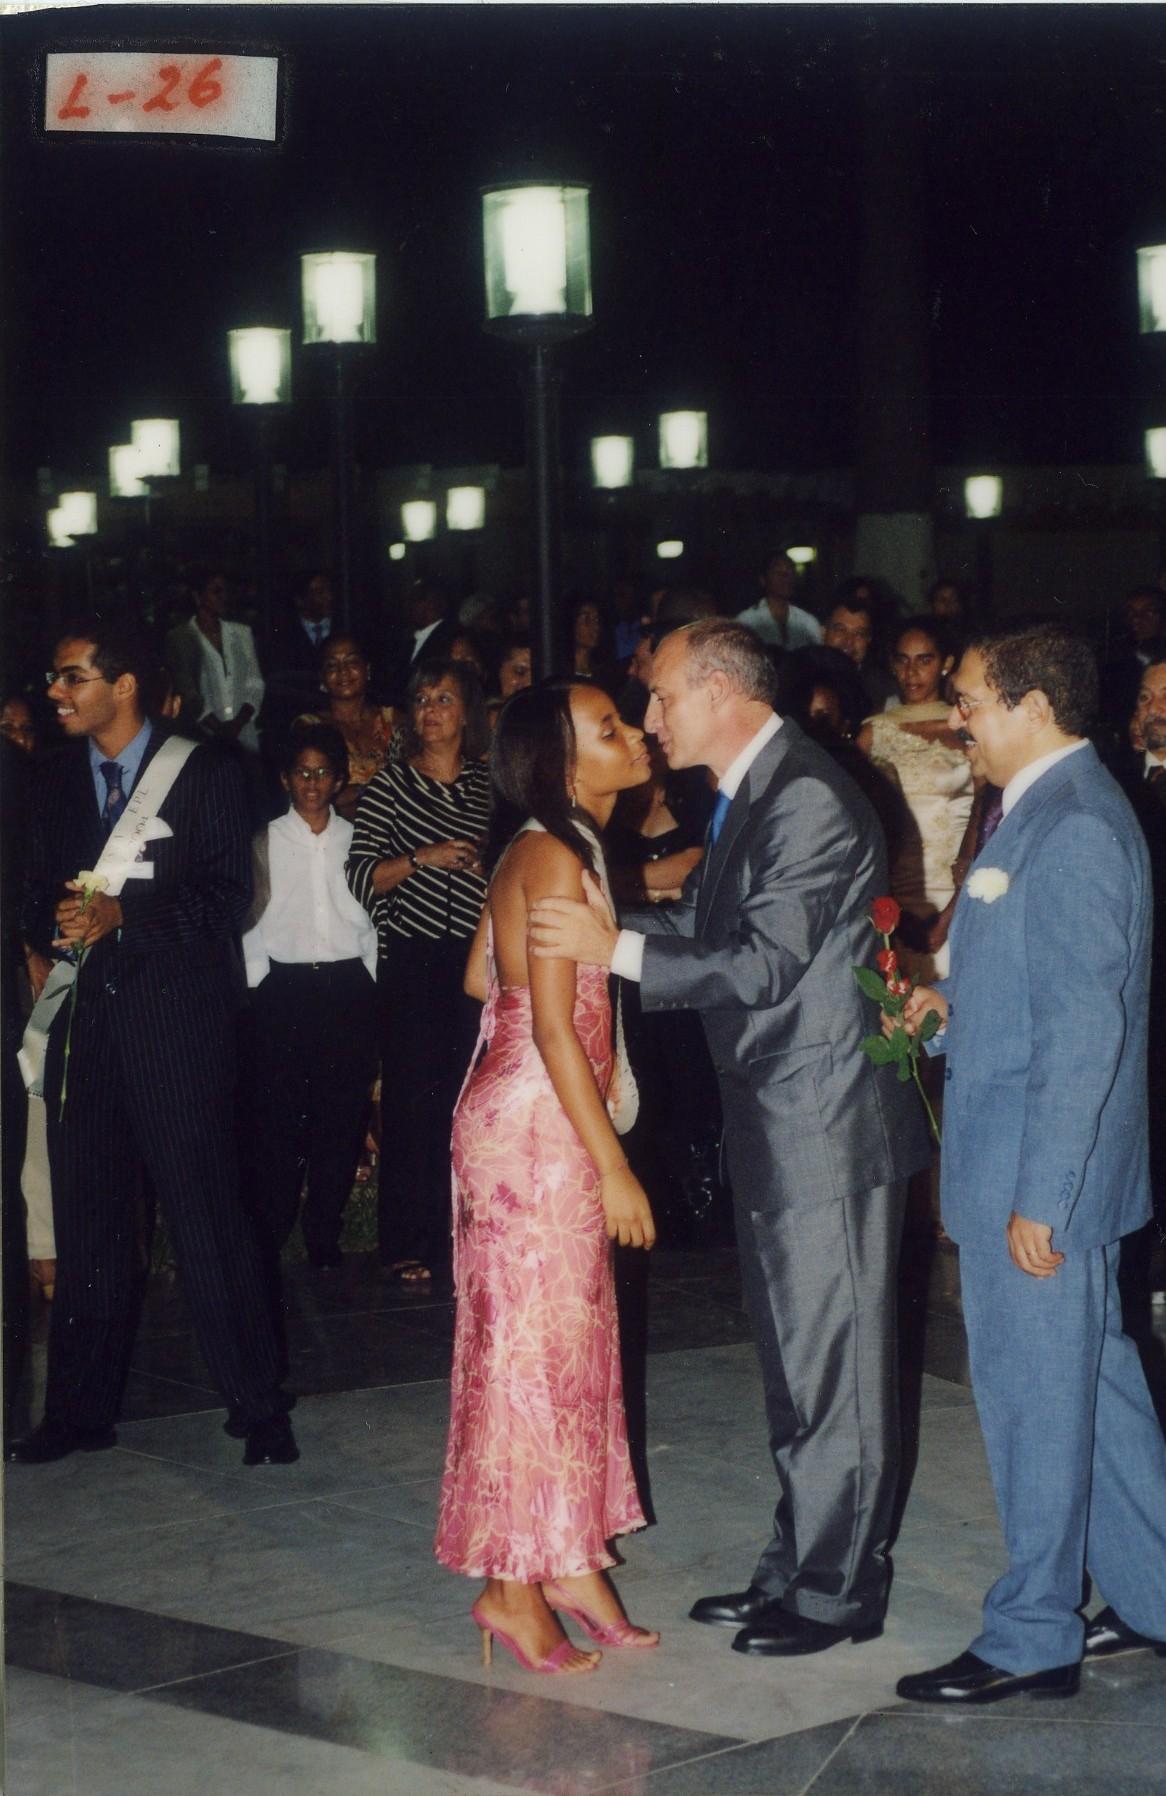 baile de finalistas Parque Heróis de Chaves 2003-2004